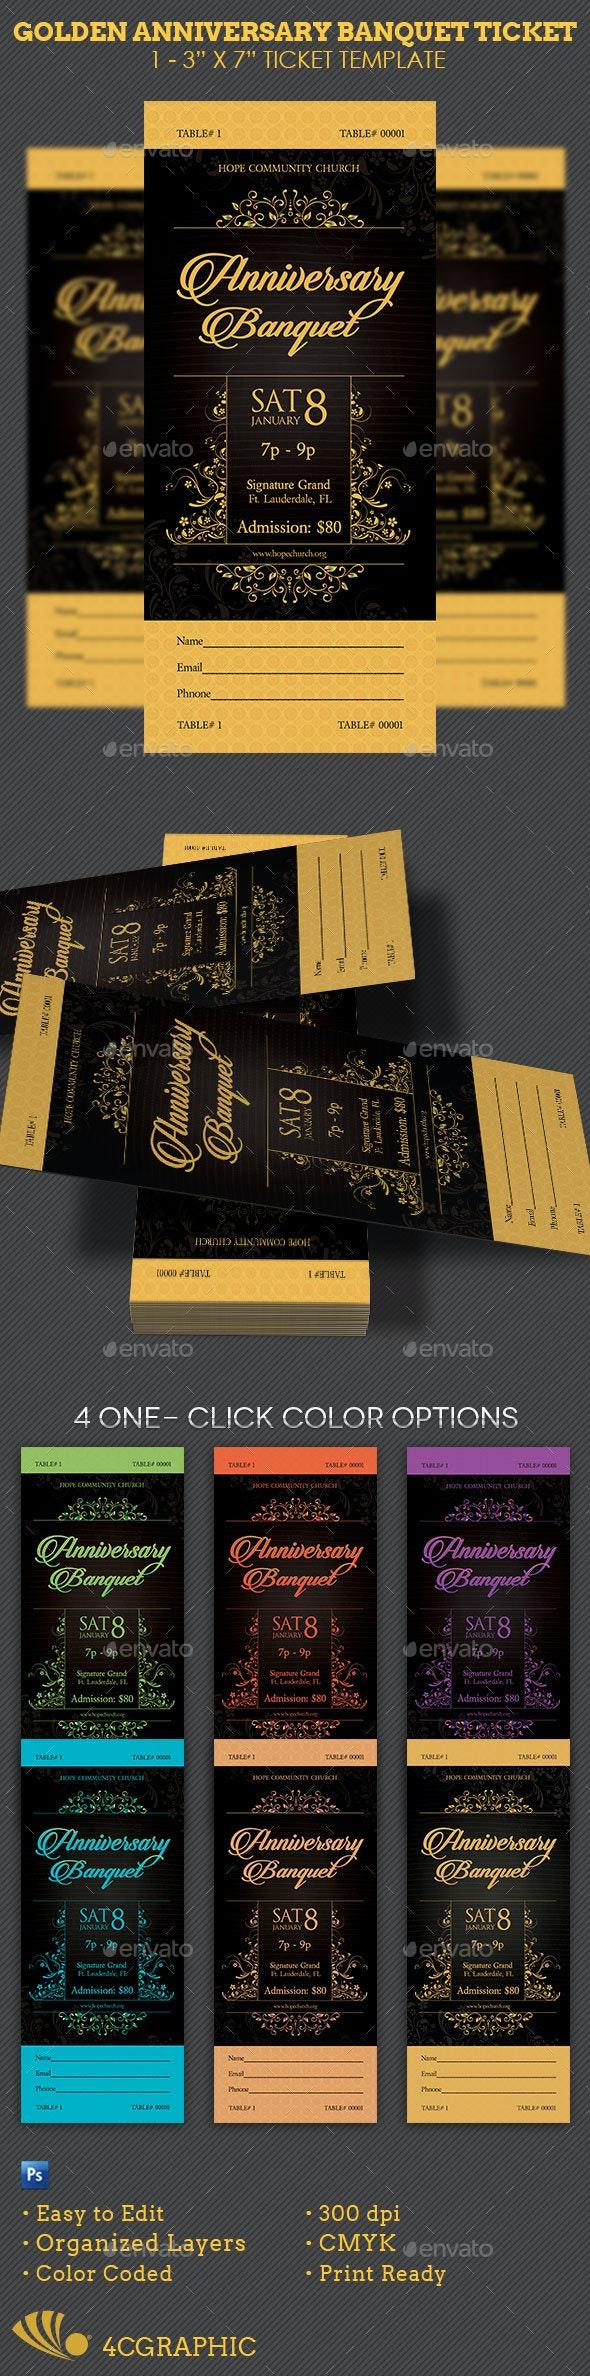 Golden Anniversary Banquet Ticket Template - Miscellaneous Print Templates